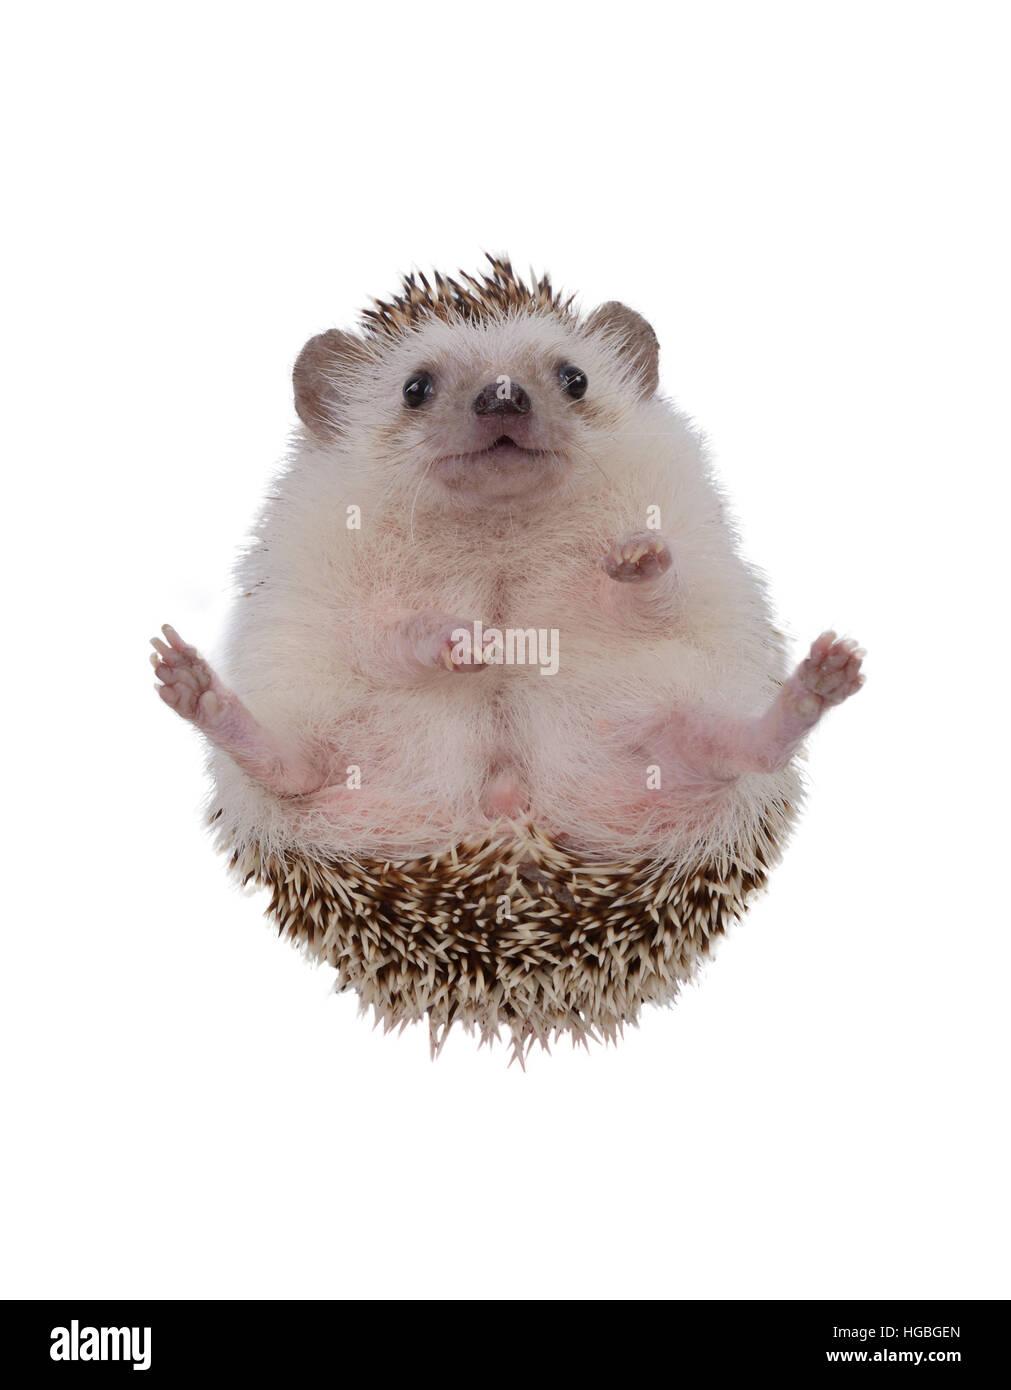 Small hedgehog upturned on white background. - Stock Image